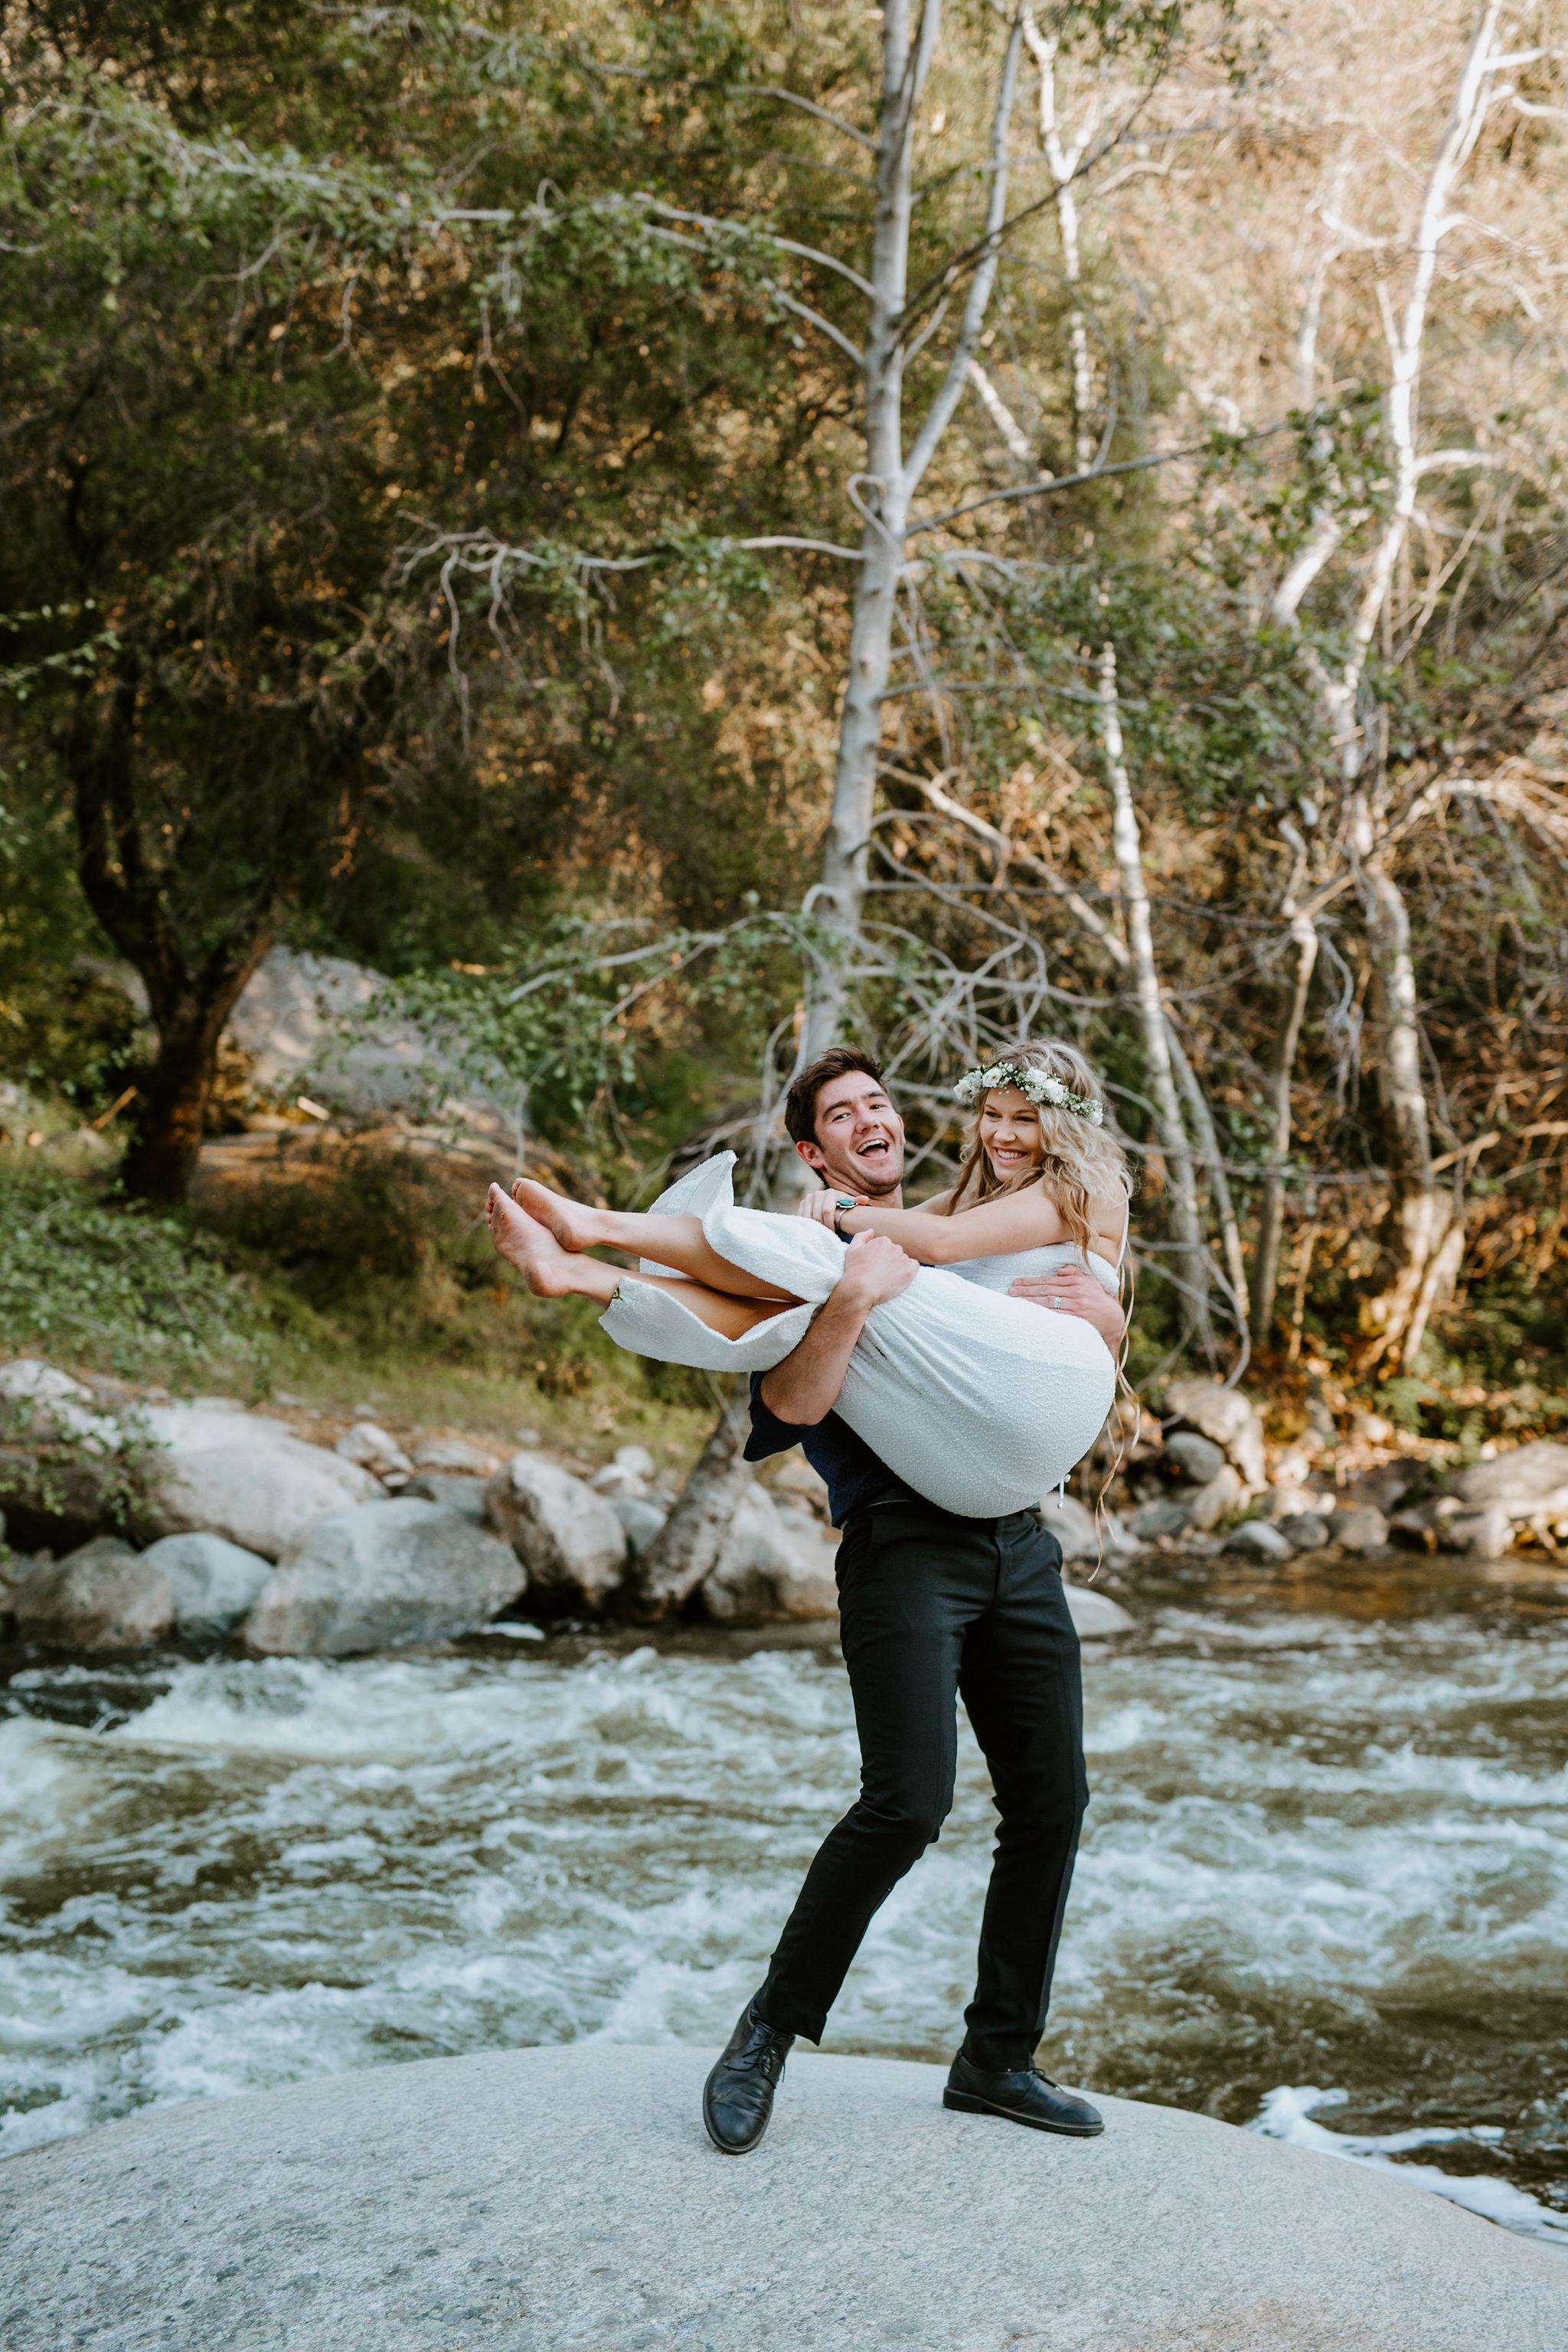 RedwoodRanch_Geoff&LyndsiPhotography_Mike&Amanda_Romantics67.jpg